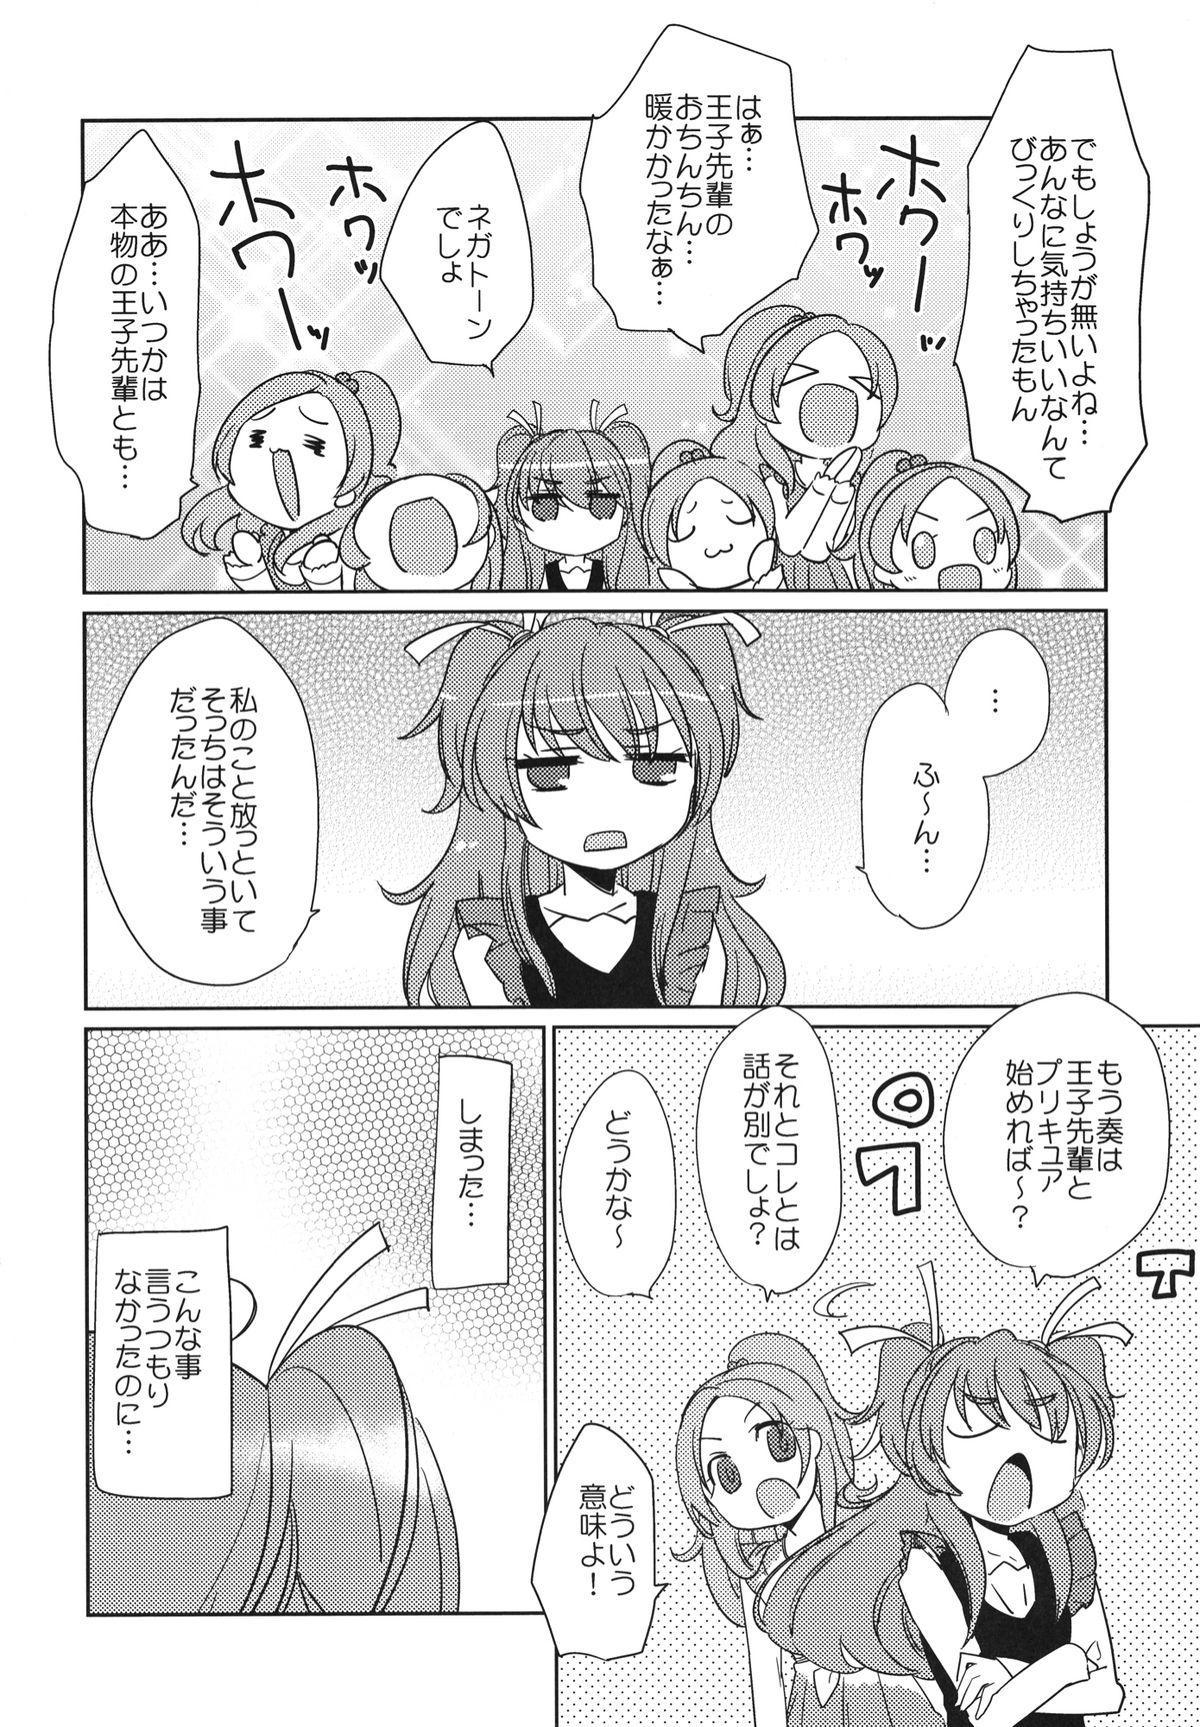 Sanbyoushi! 46